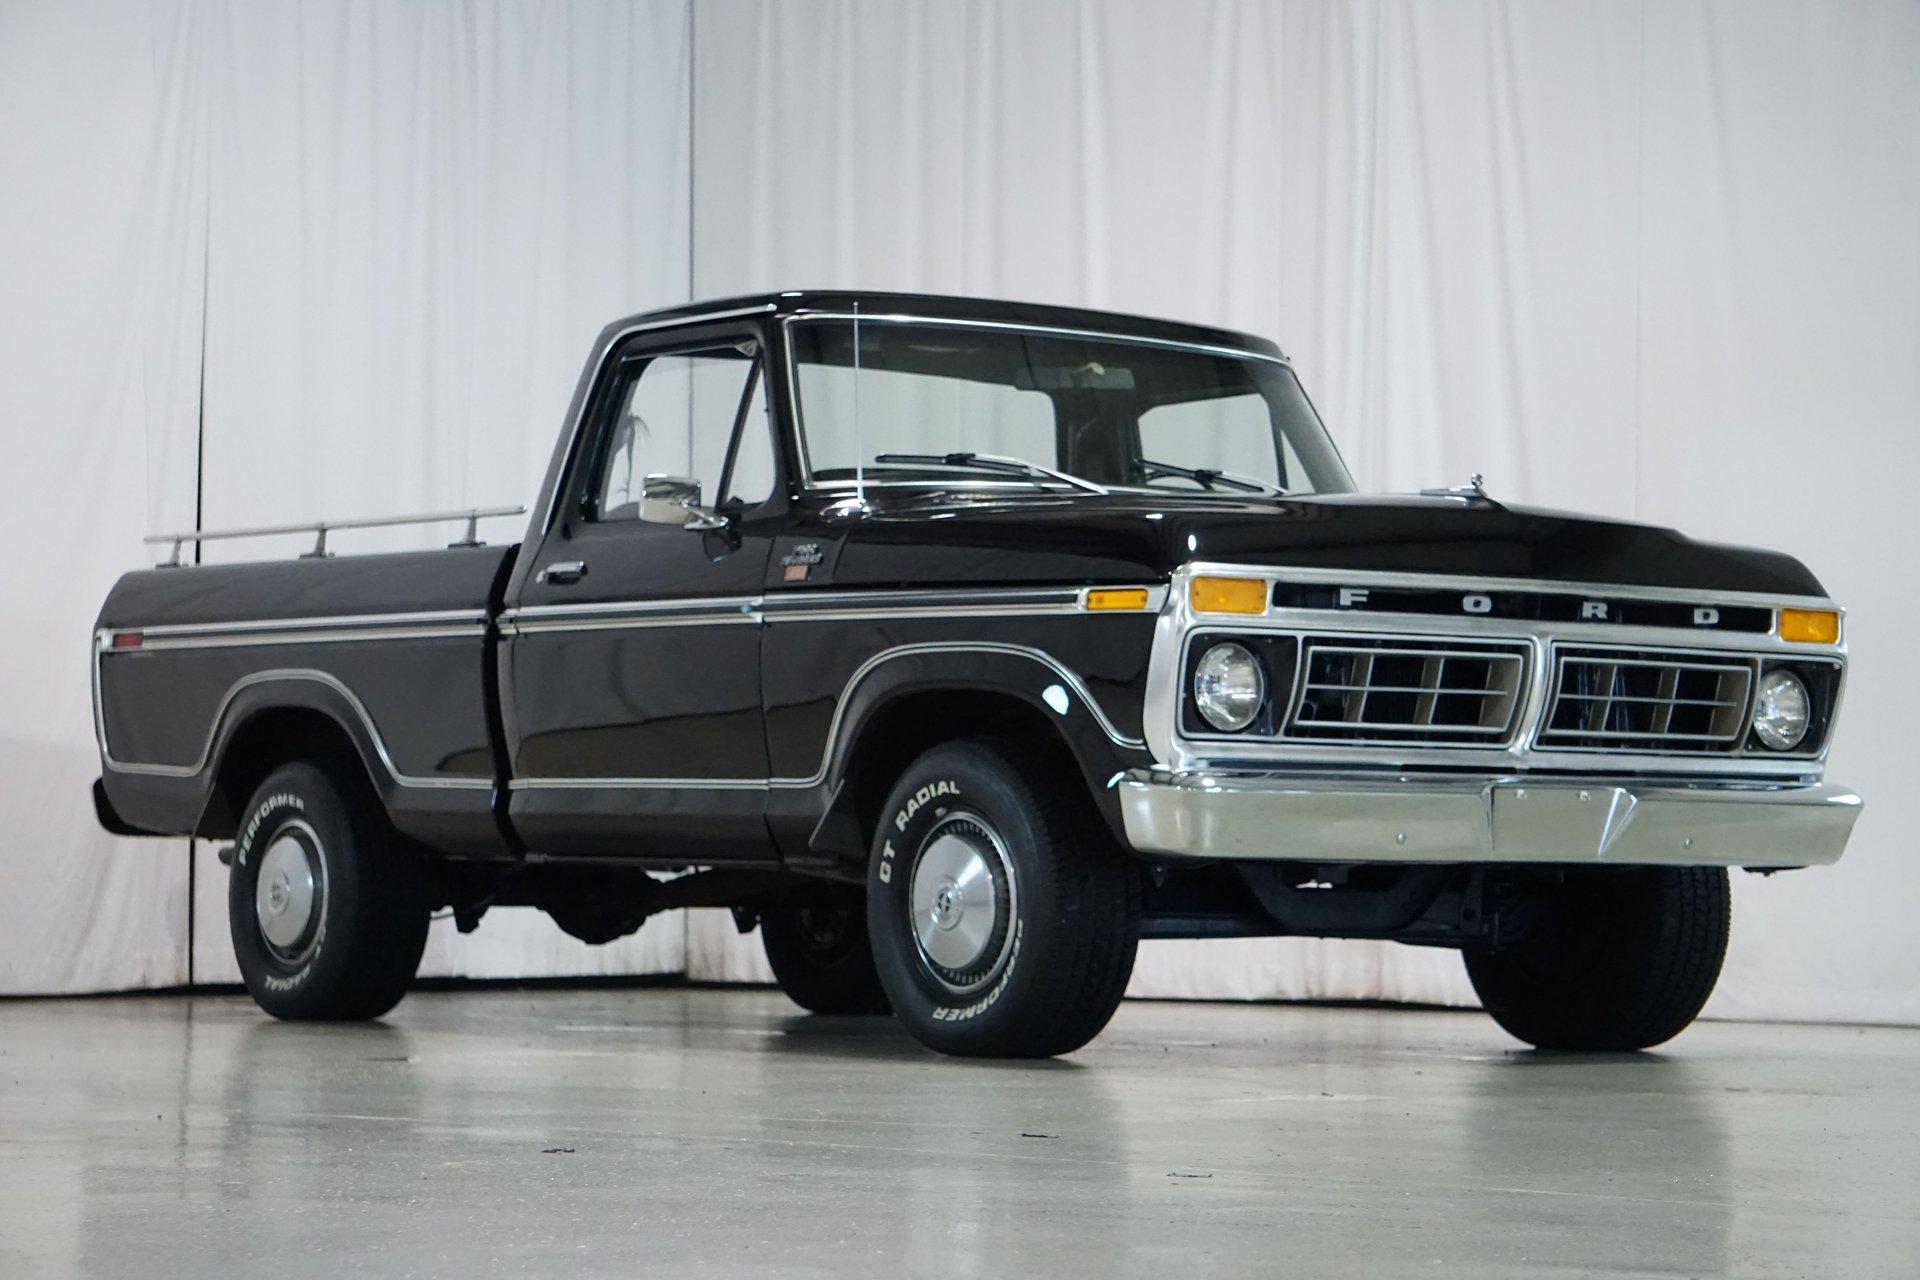 1977 ford f100 xlt pickup